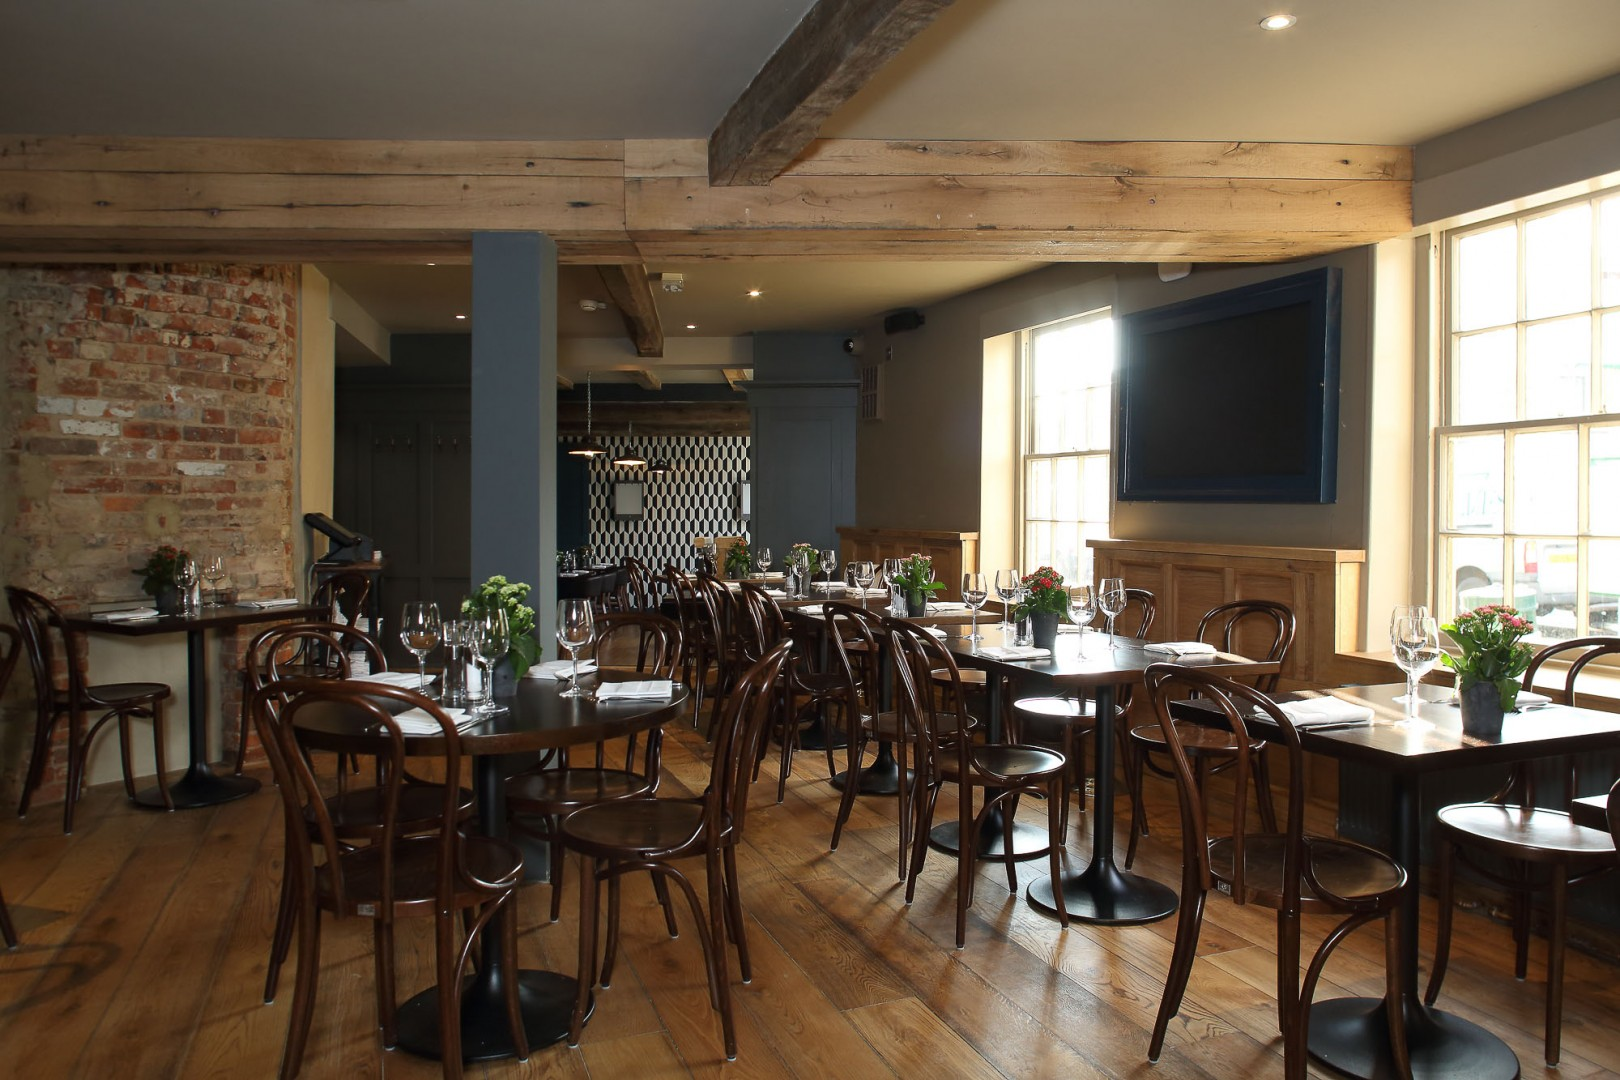 Crown and Thistle restaurant Abingdon